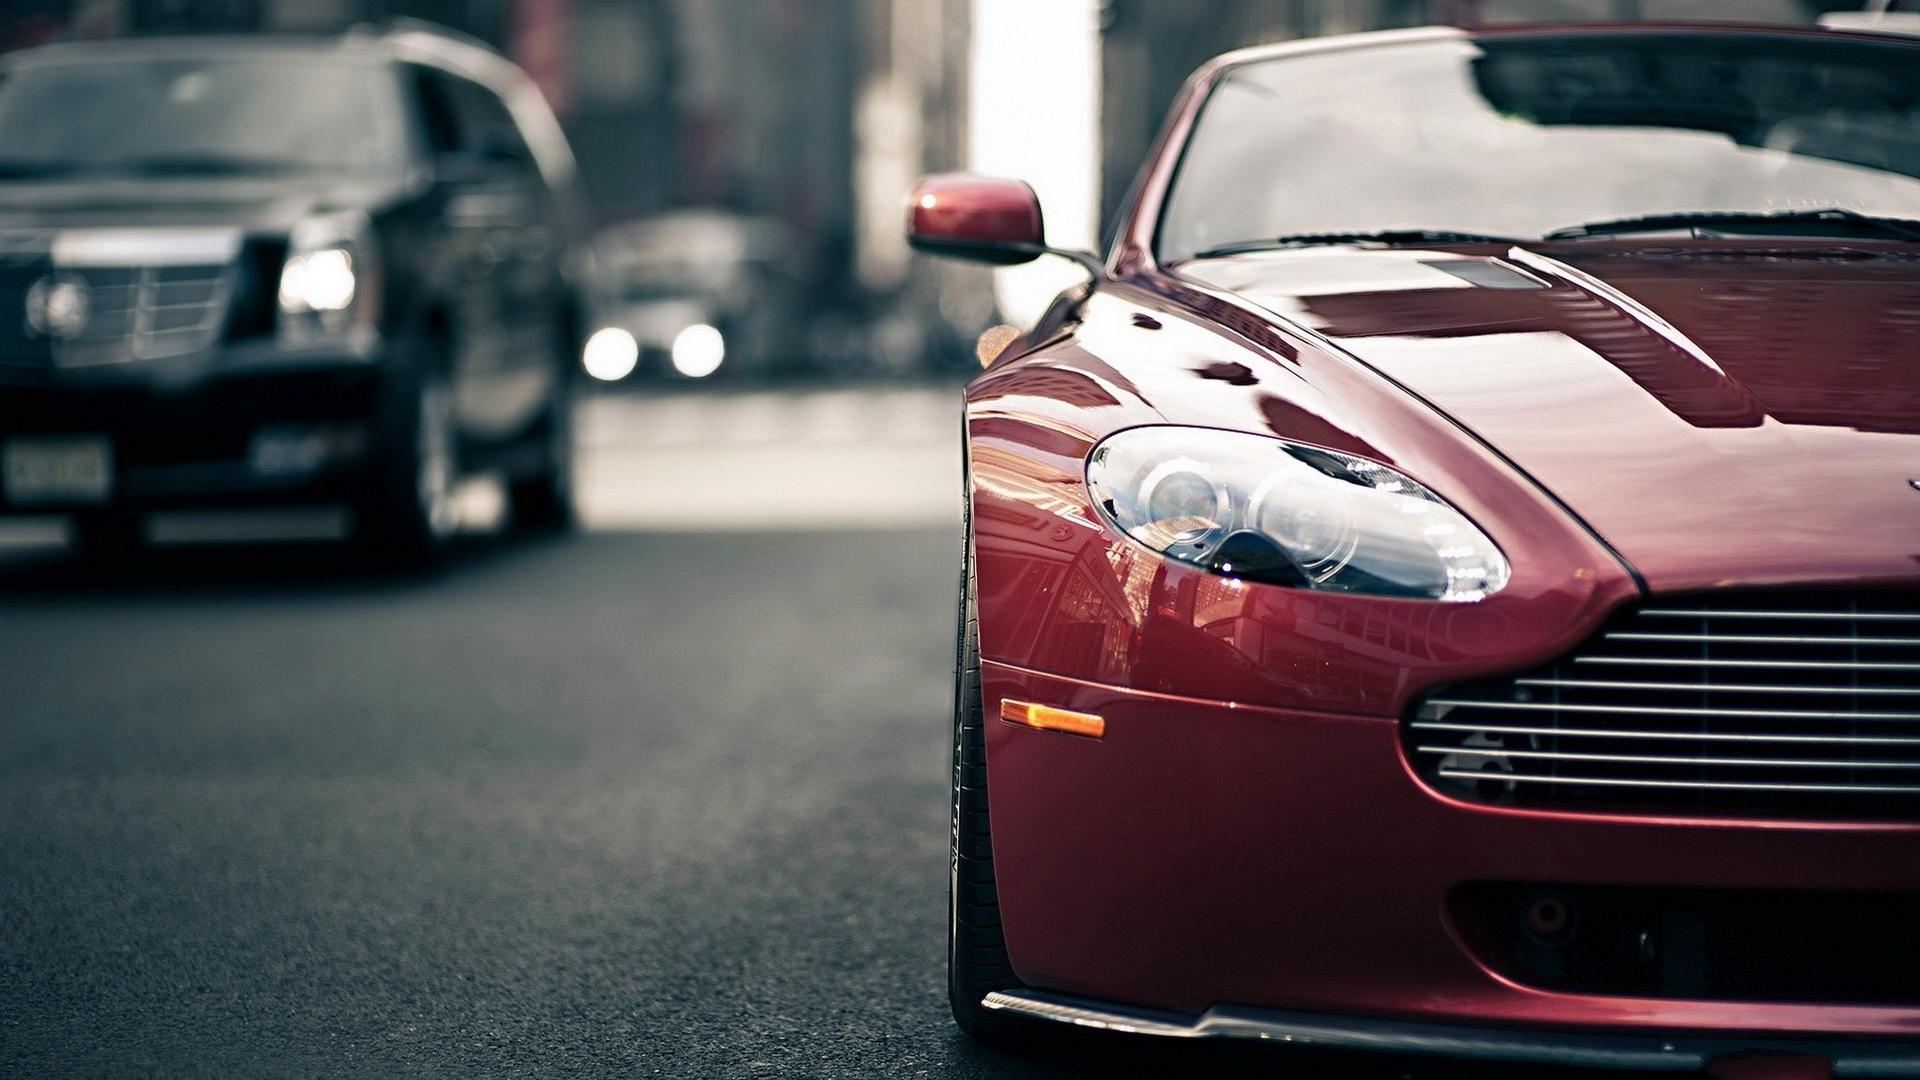 Aston Martin суперкар ночь город  № 2374867 загрузить